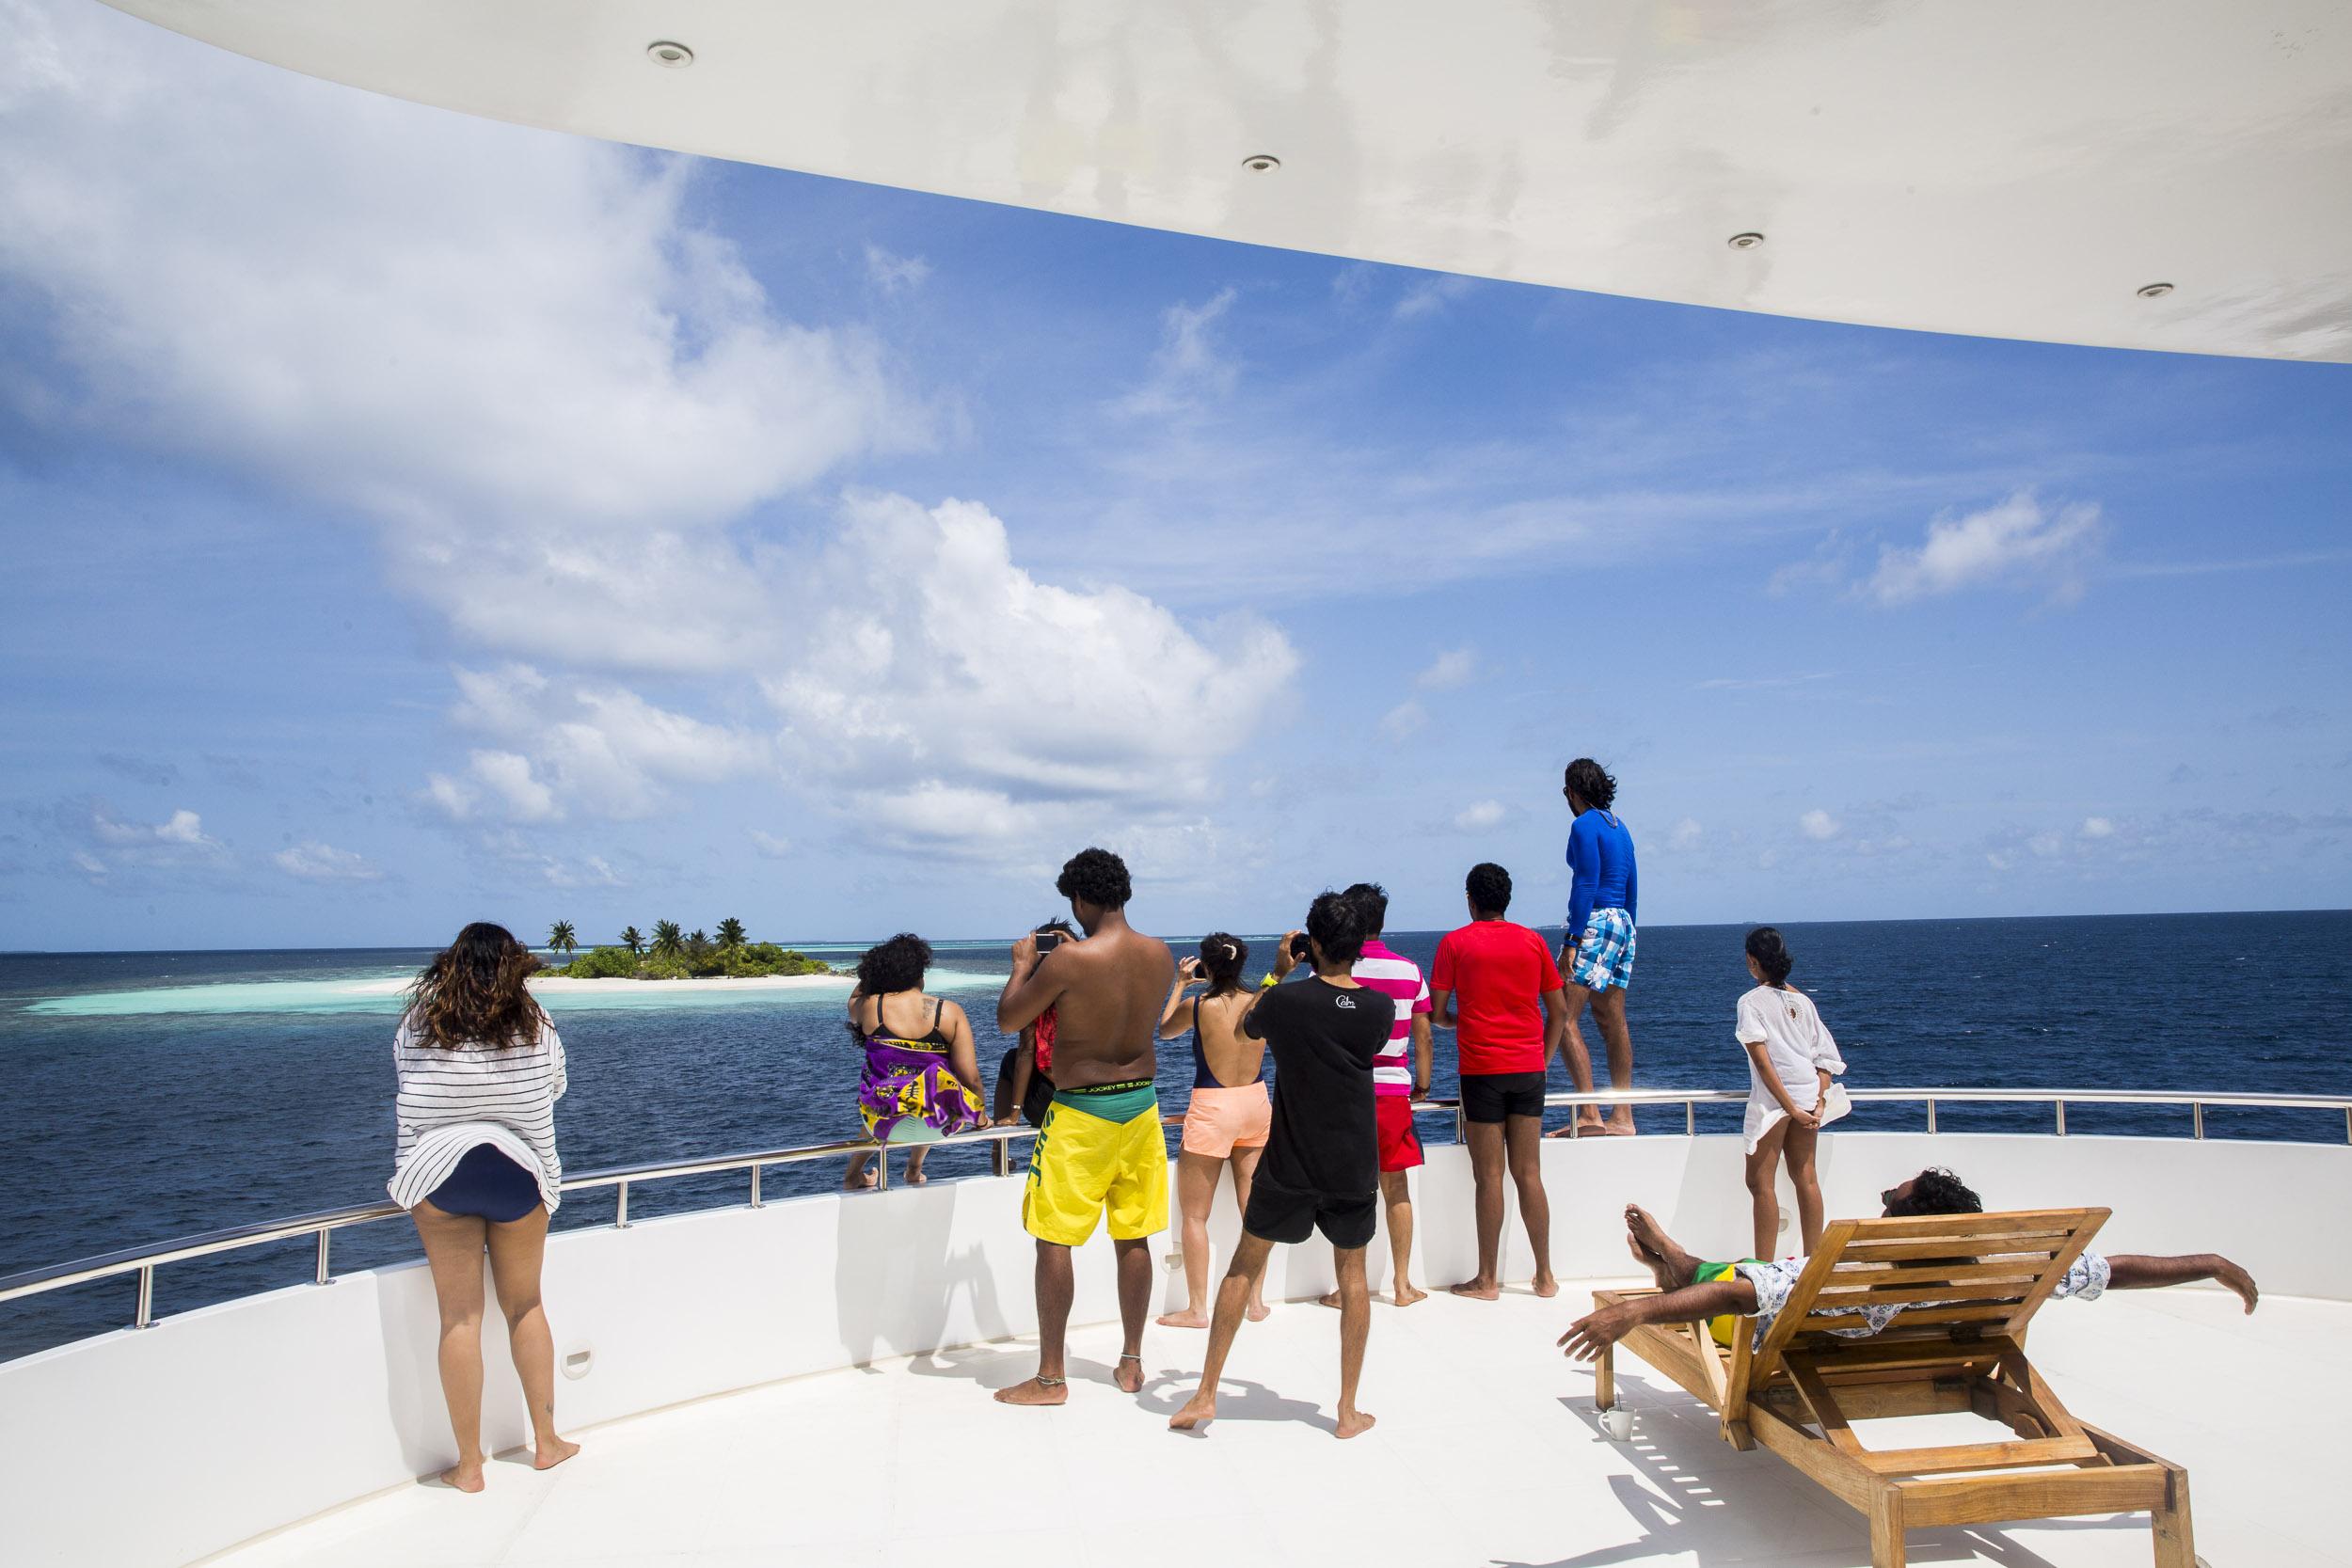 liveaboard-maldives-scuba-diving-3.jpg